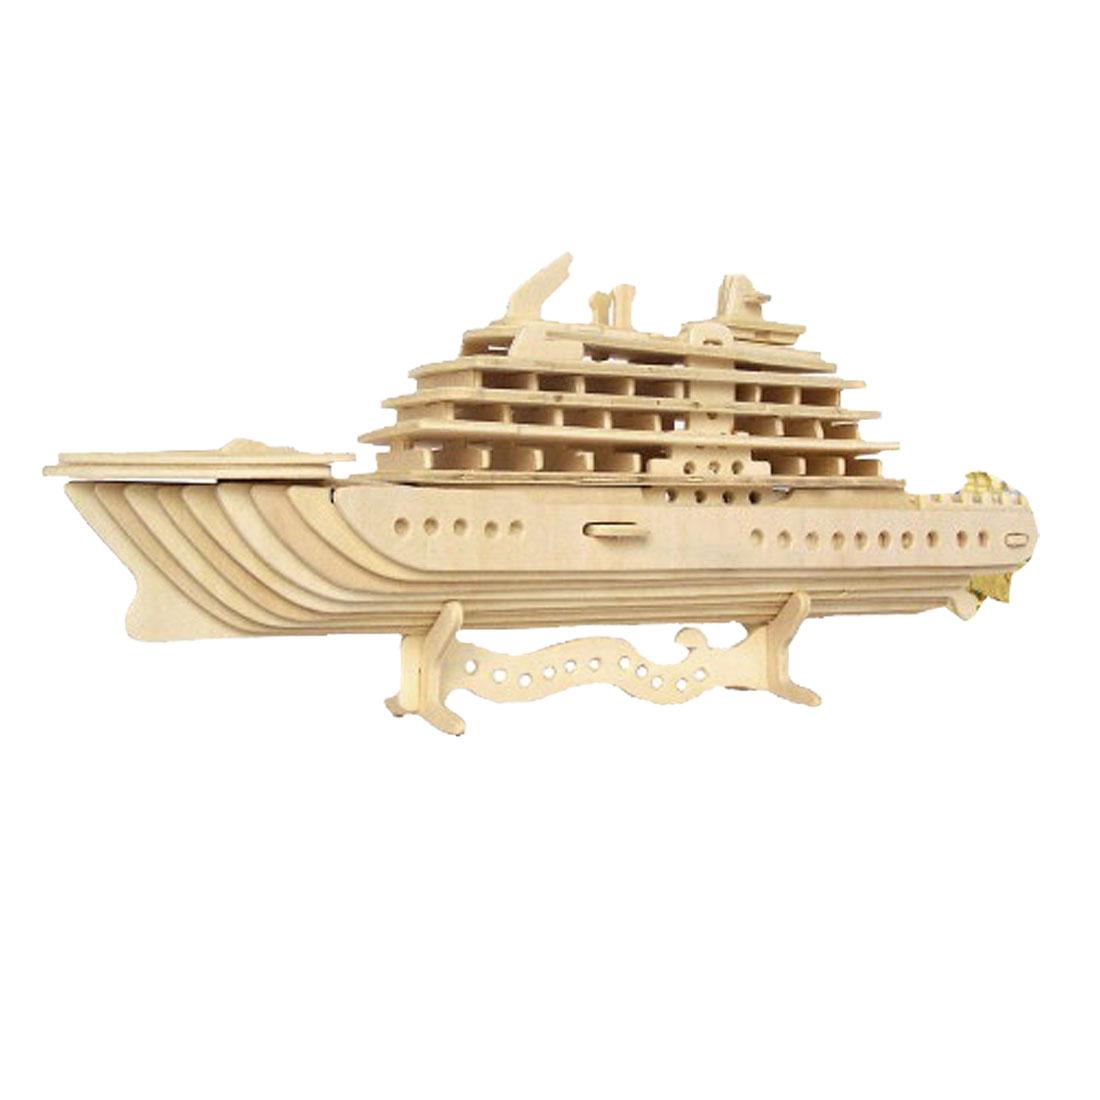 Luxury Yacht Model Wood Construction Kit DIY Puzzle Toy Gift